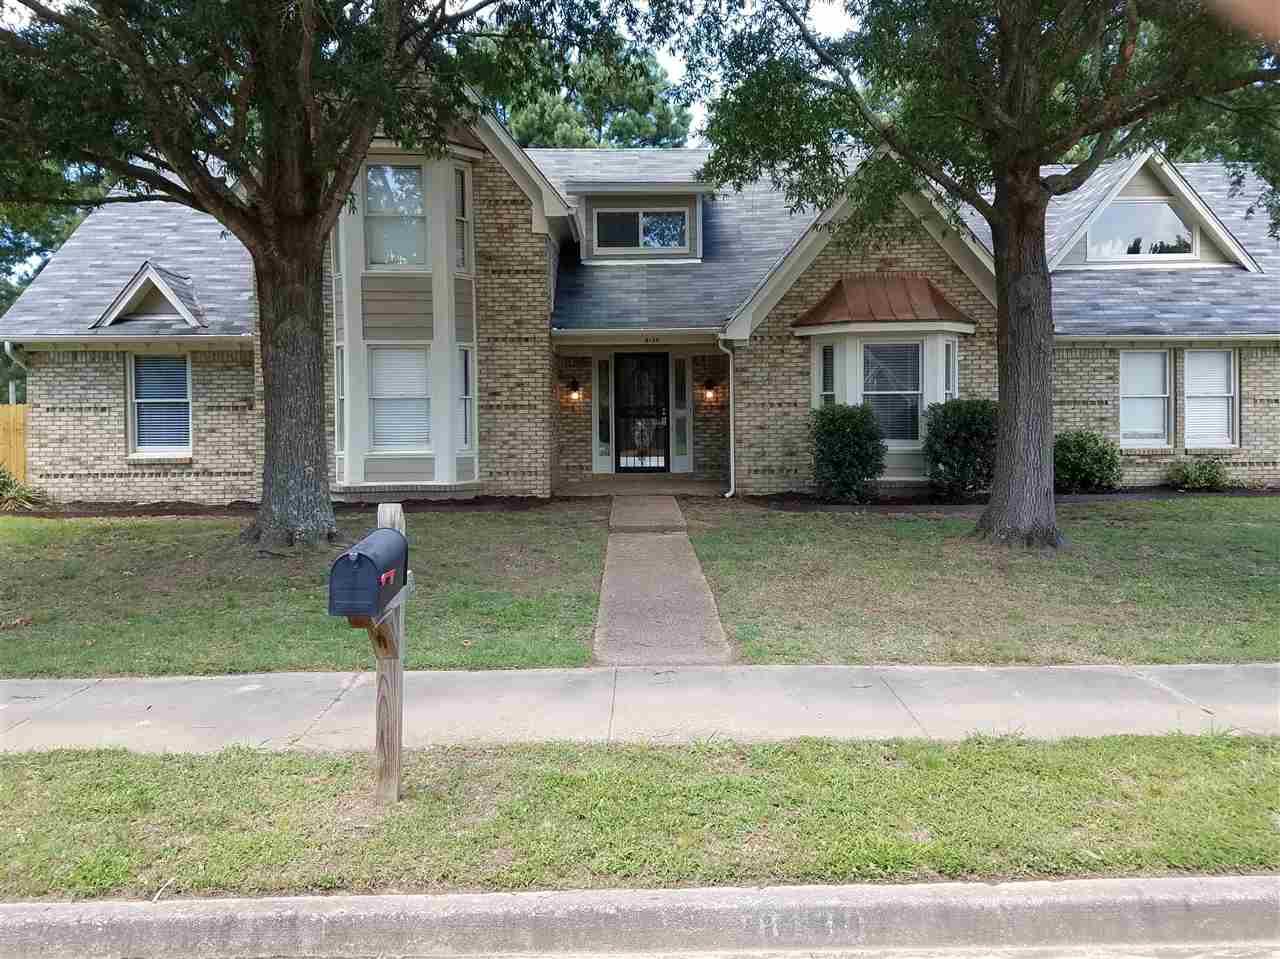 8130 Green Belt Memphis, TN 38125 - MLS #: 10005097